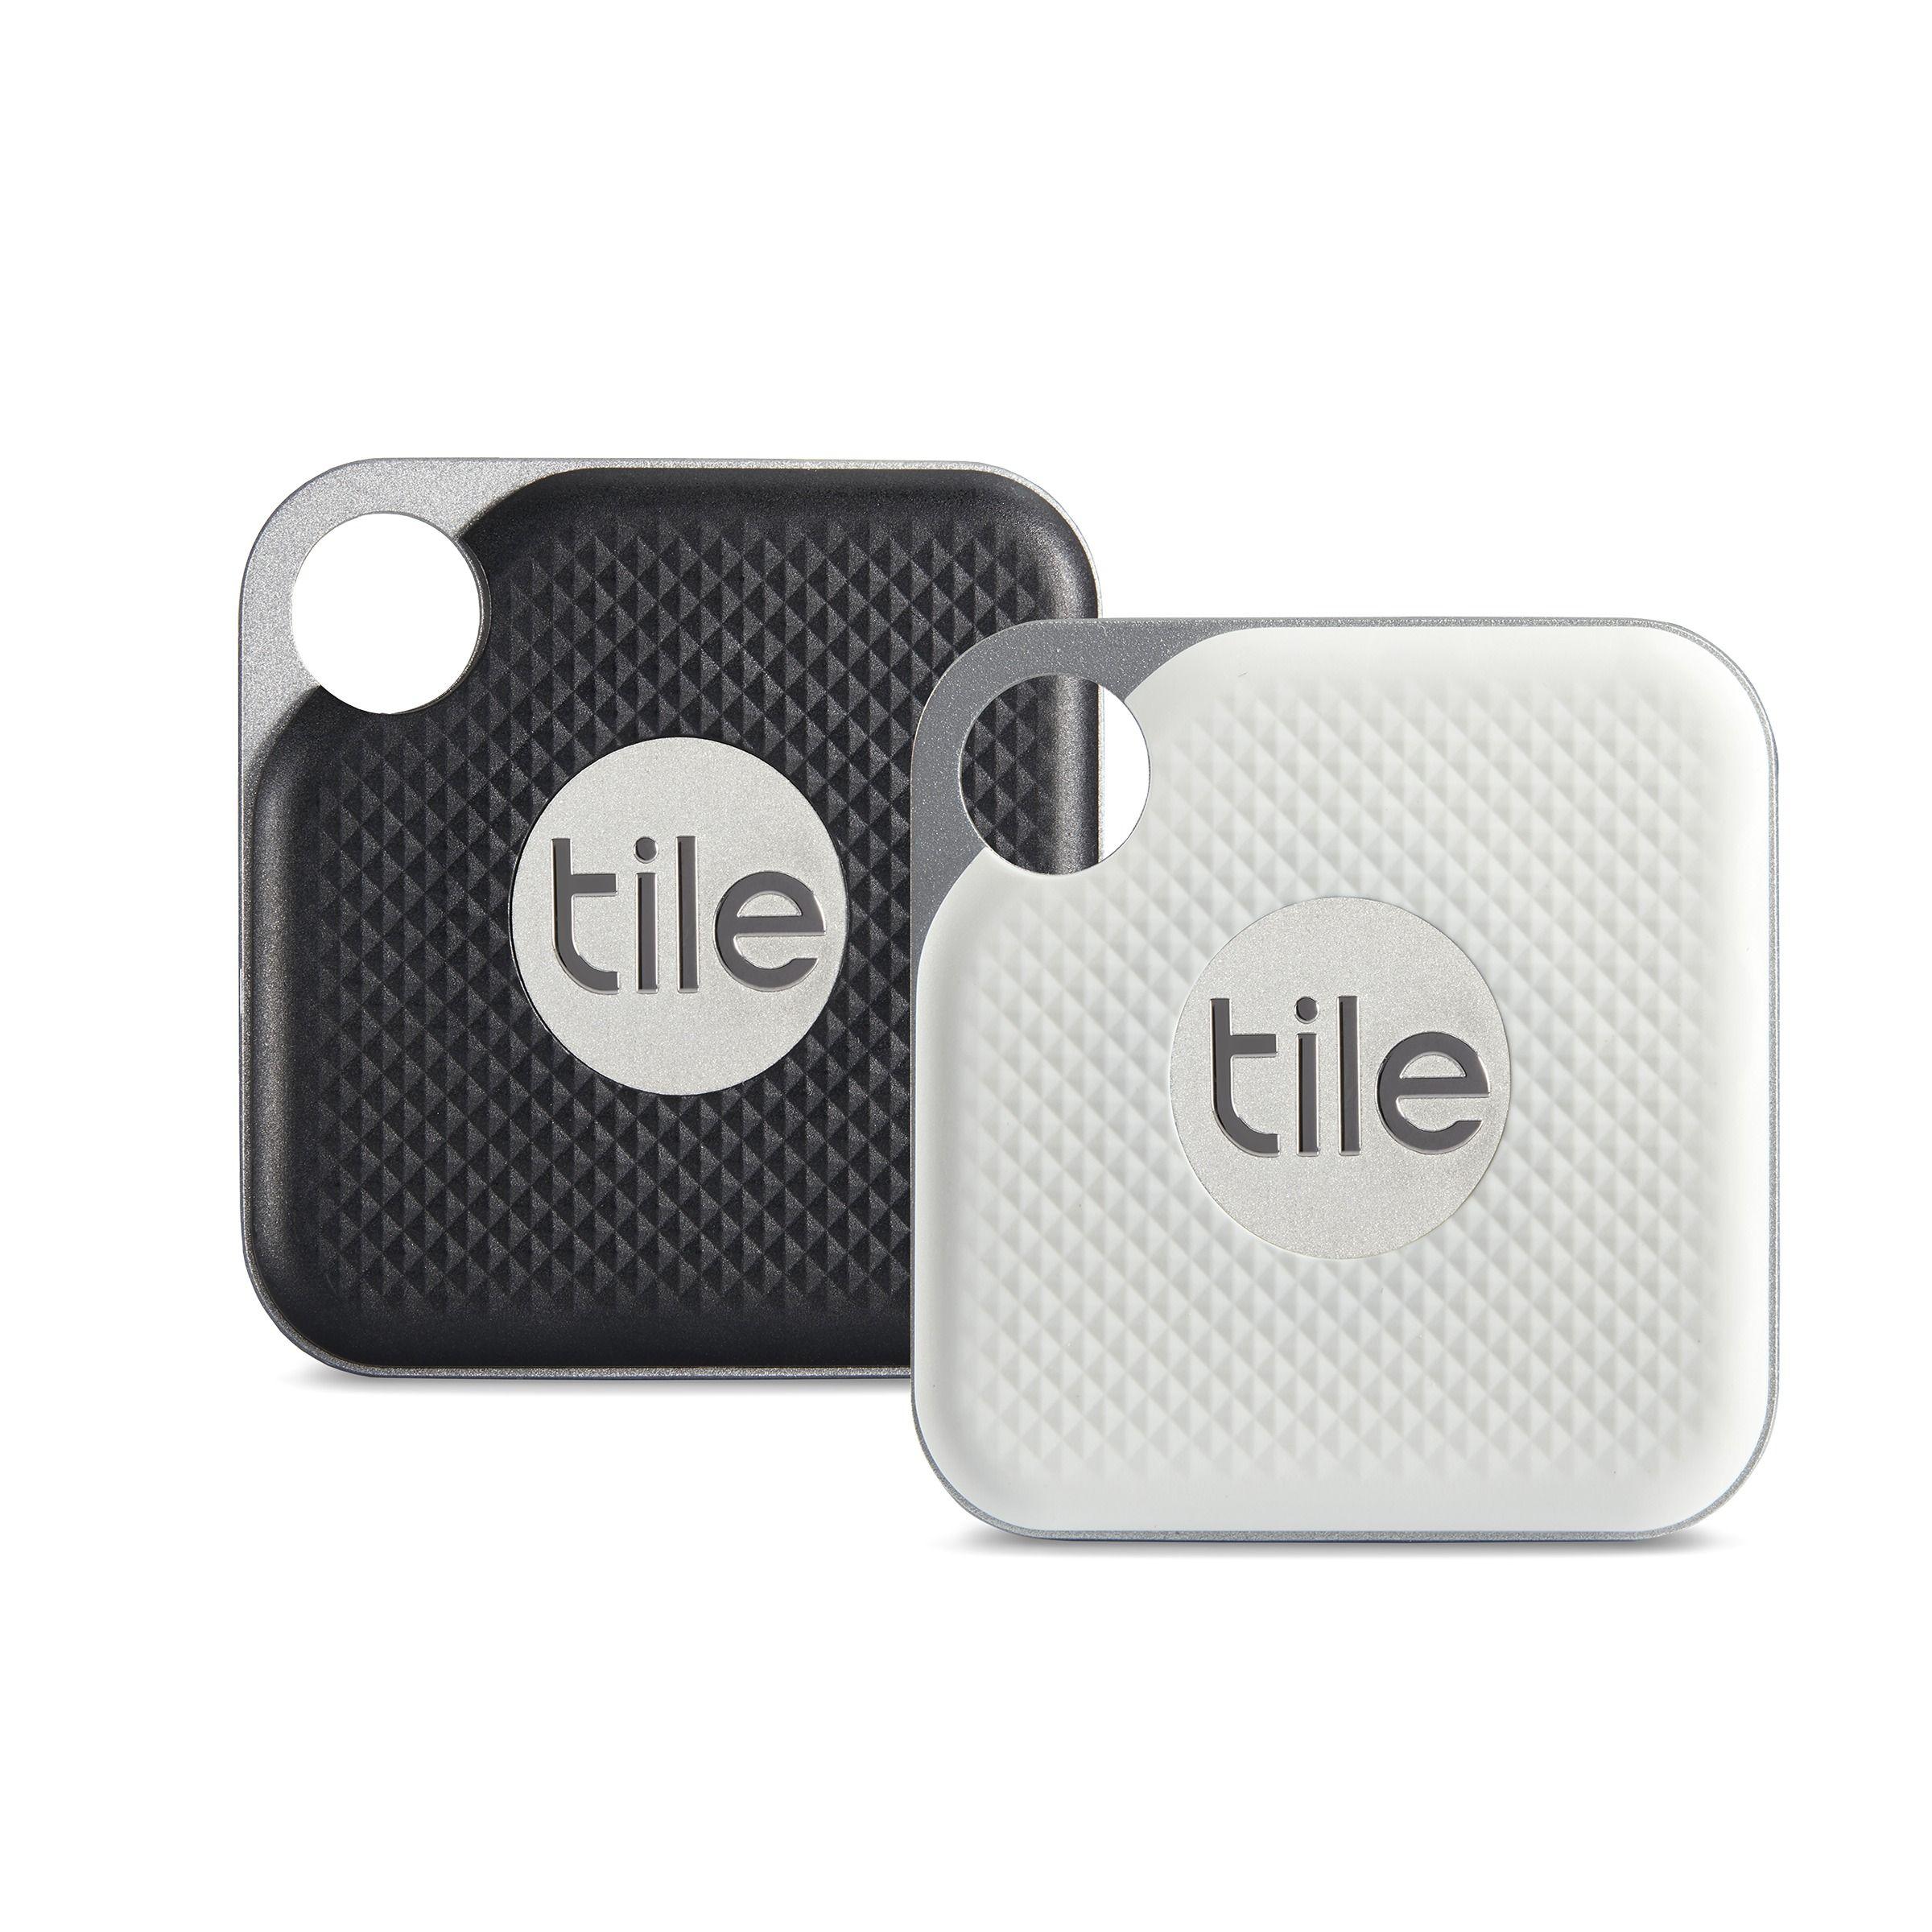 Tile Pro tracker (2 stuks, zwart & wit) @ Gamma